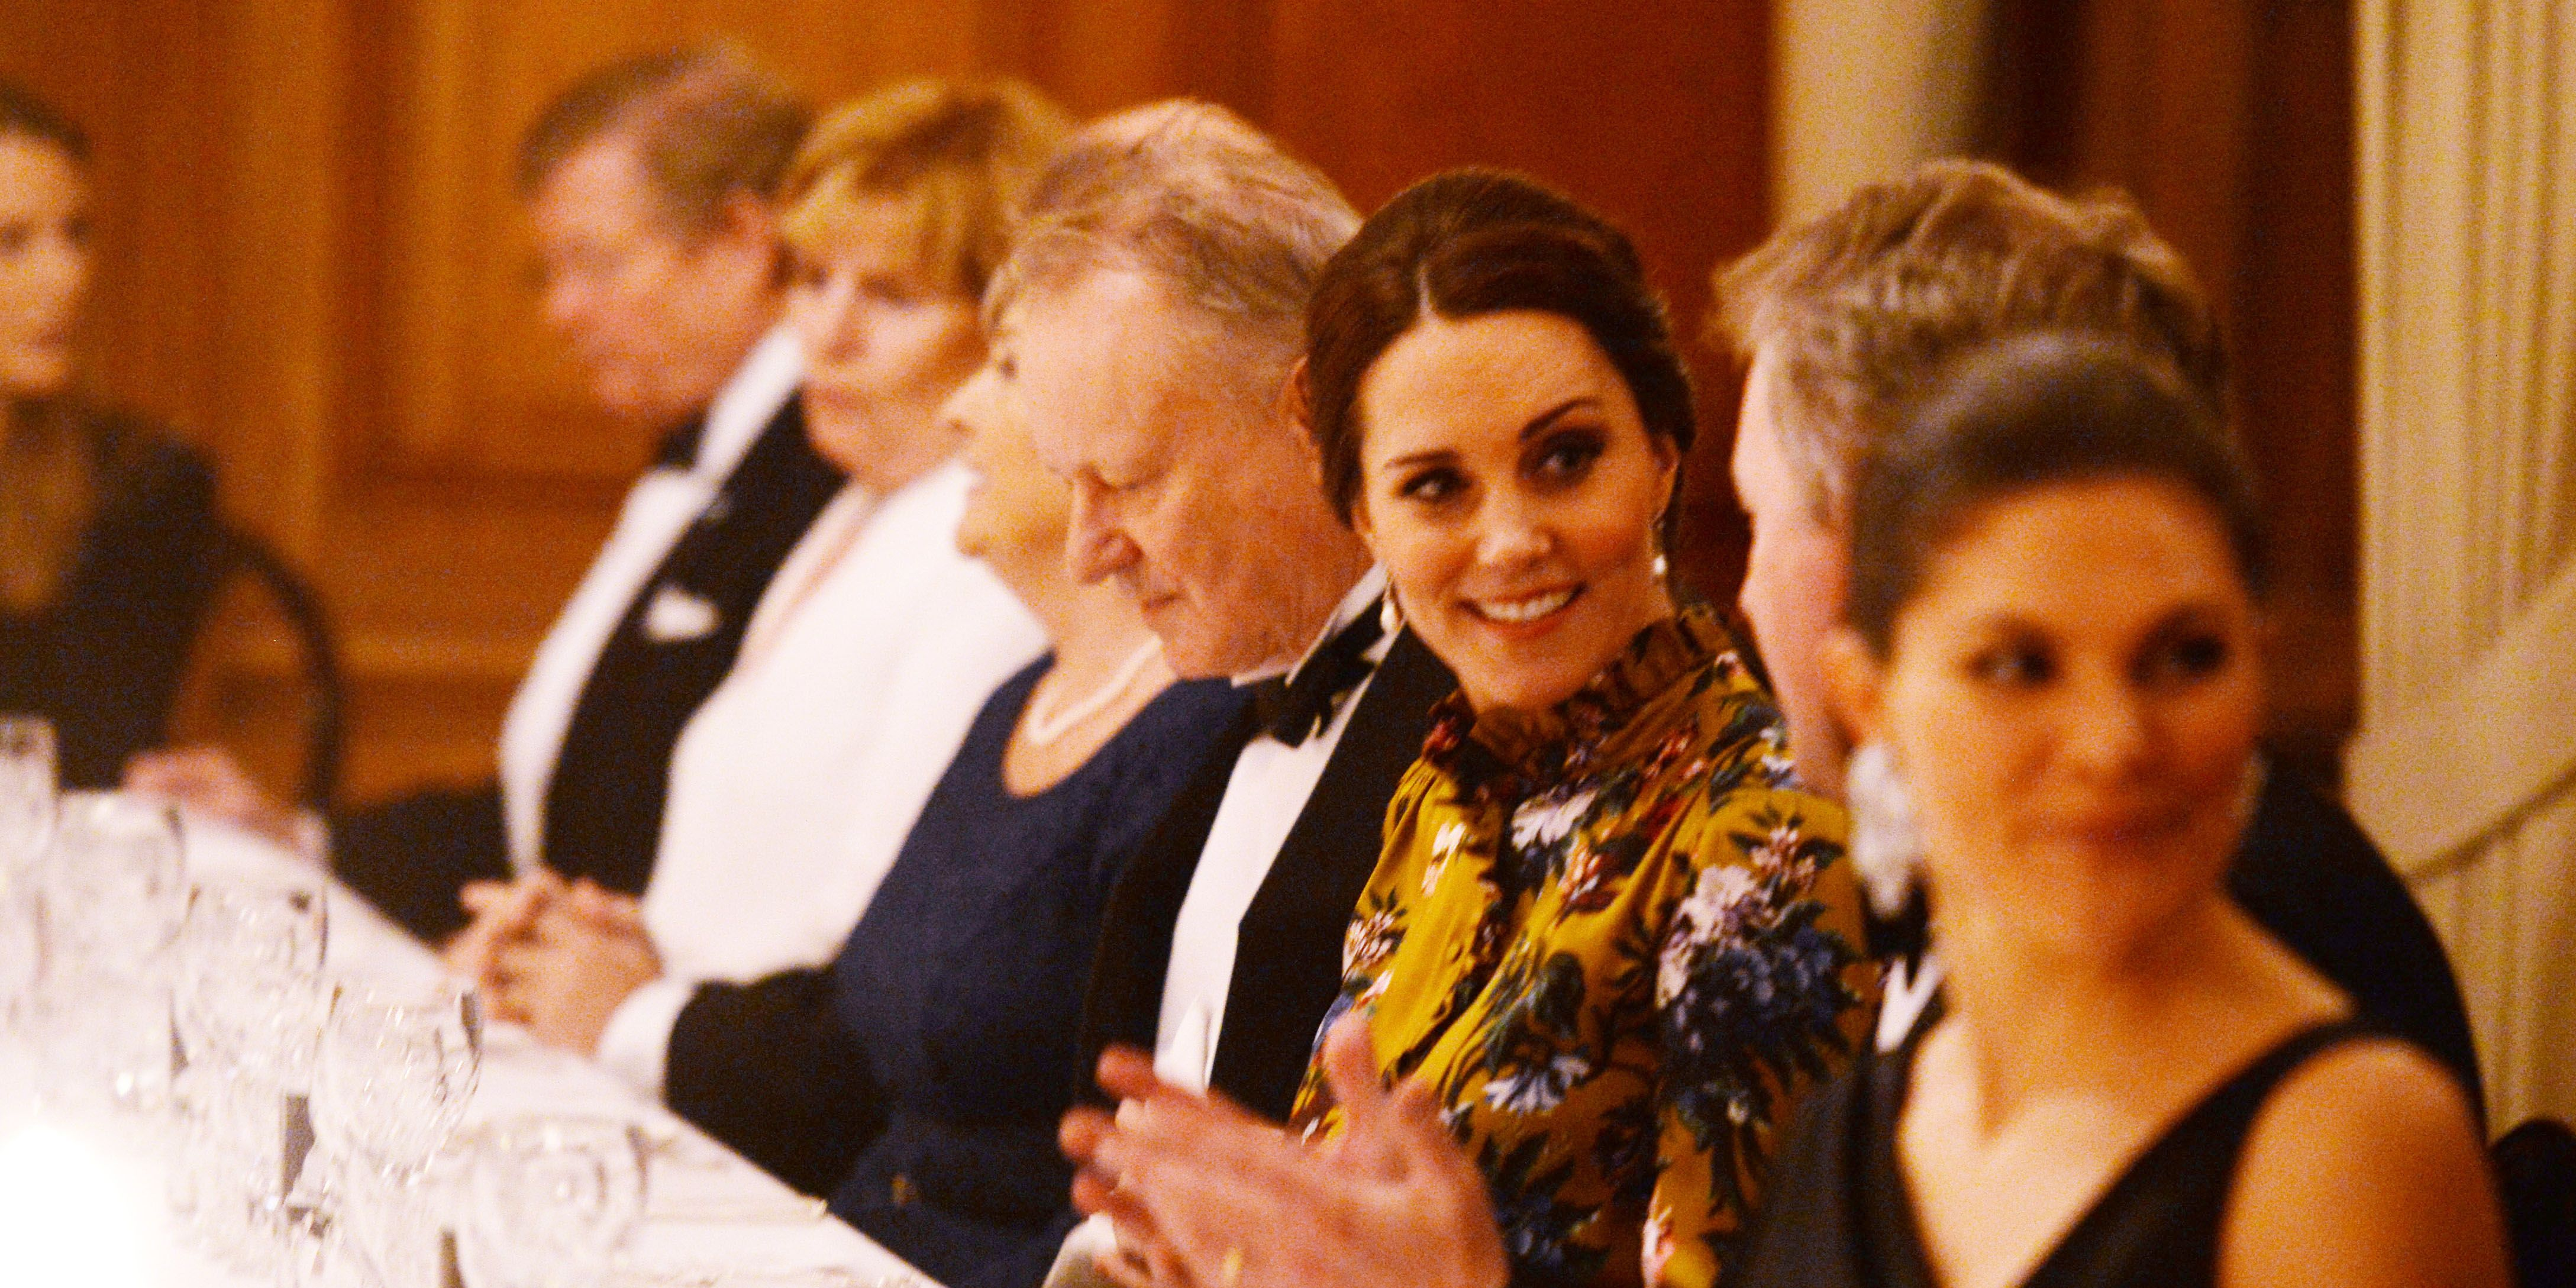 The Duchess of Cambridge, royal tour